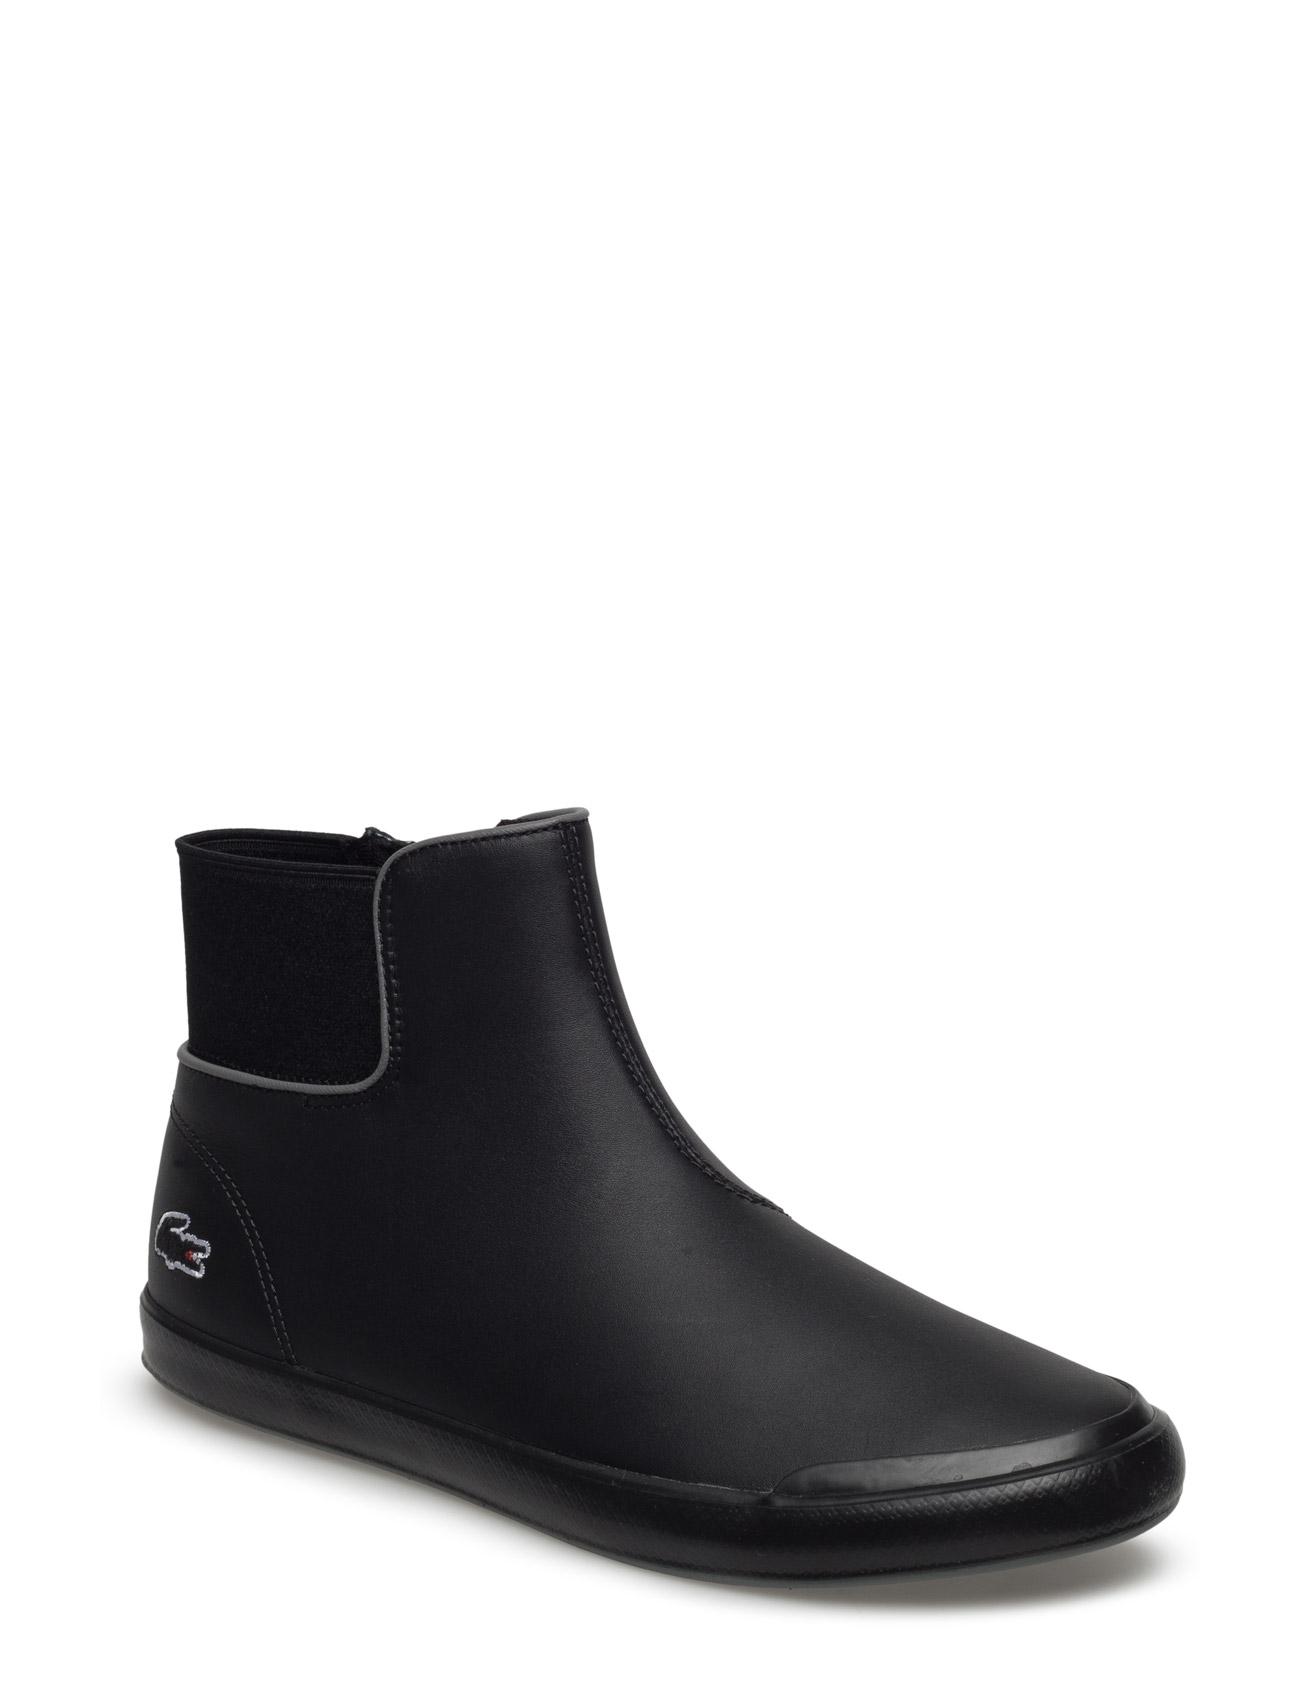 Lancelle Chels3161 Lacoste Shoes Støvler til Damer i Sort